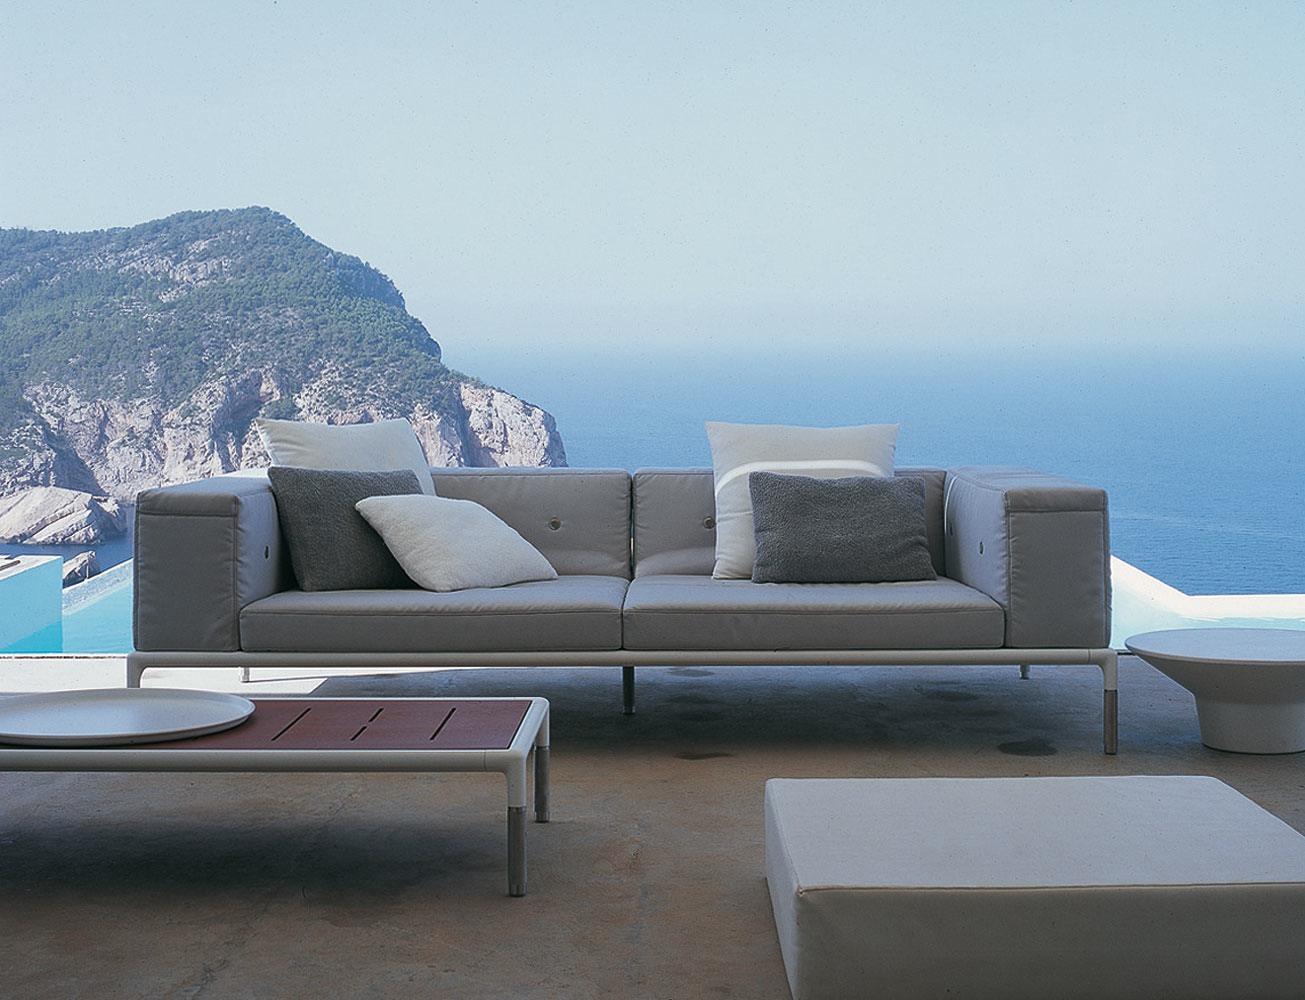 B Amp B Italia Springtime 2 Seater Sofa Couture Outdoor